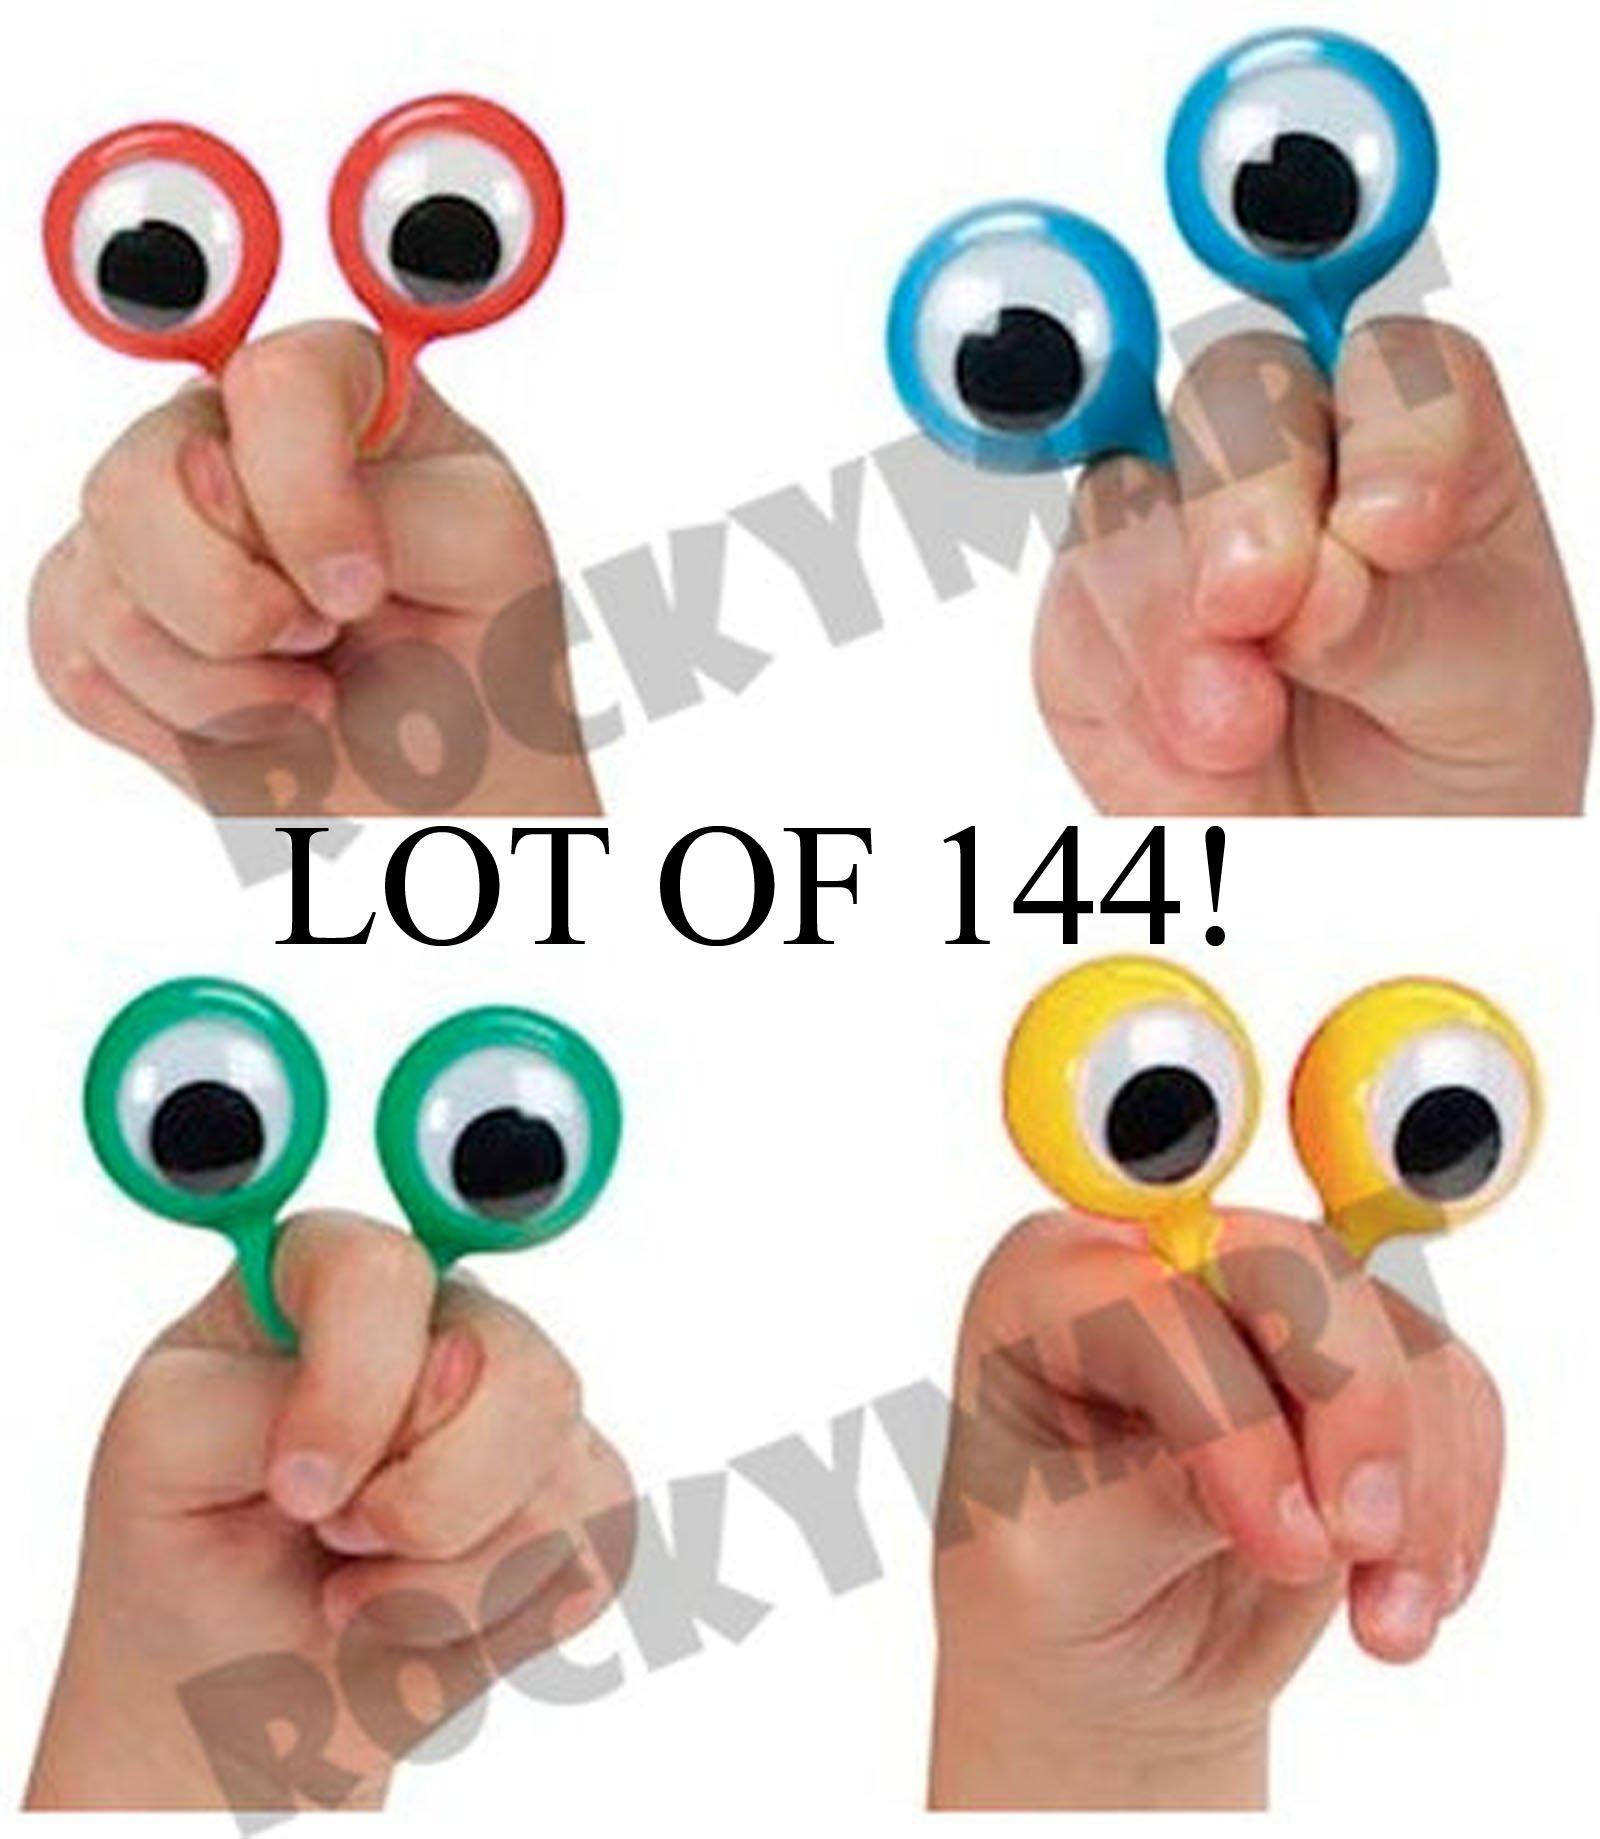 WHOLESALE LOT - *144* Finger Wiggly EYE Puppet Ring - 12 DOZEN - Magic Trick Joke Gag Clown FUN! by ROCKYMART